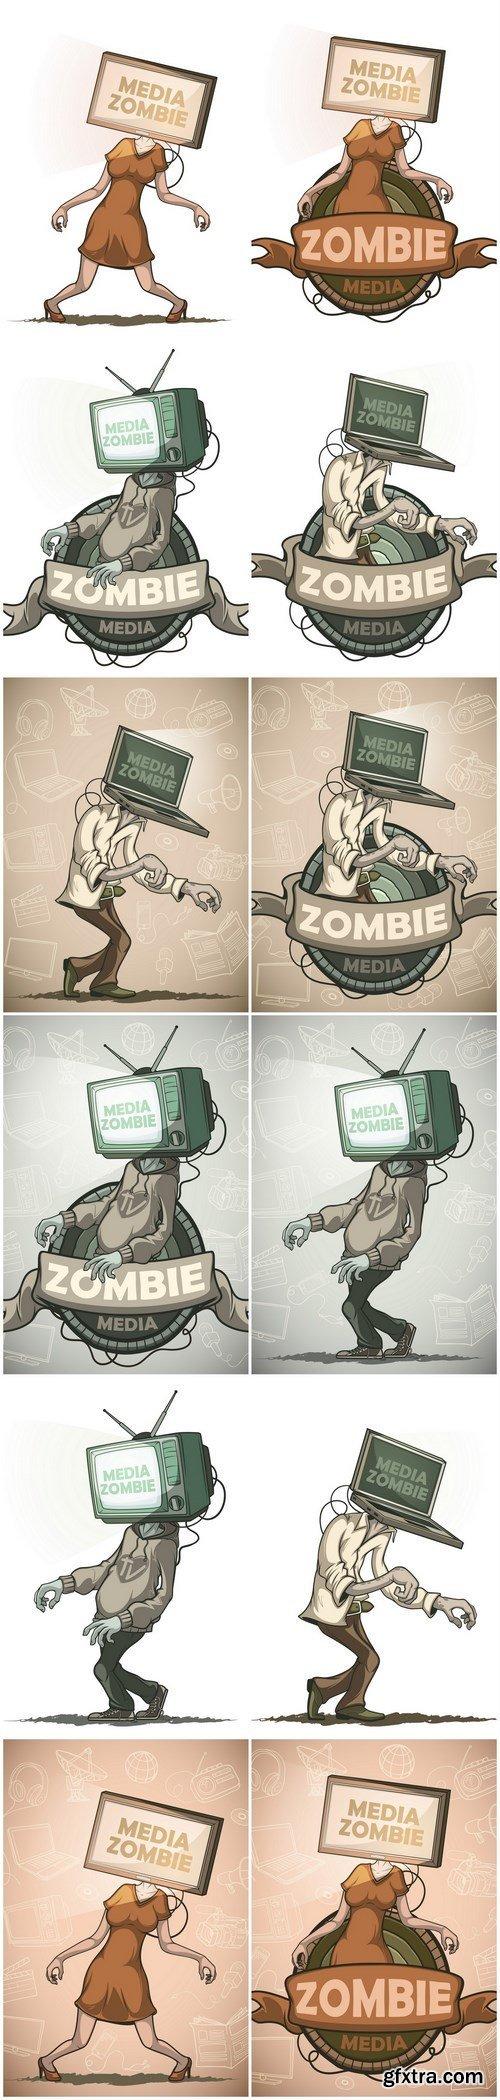 Media zombie - Set of 12xEPS, AI Professional Vector Stock